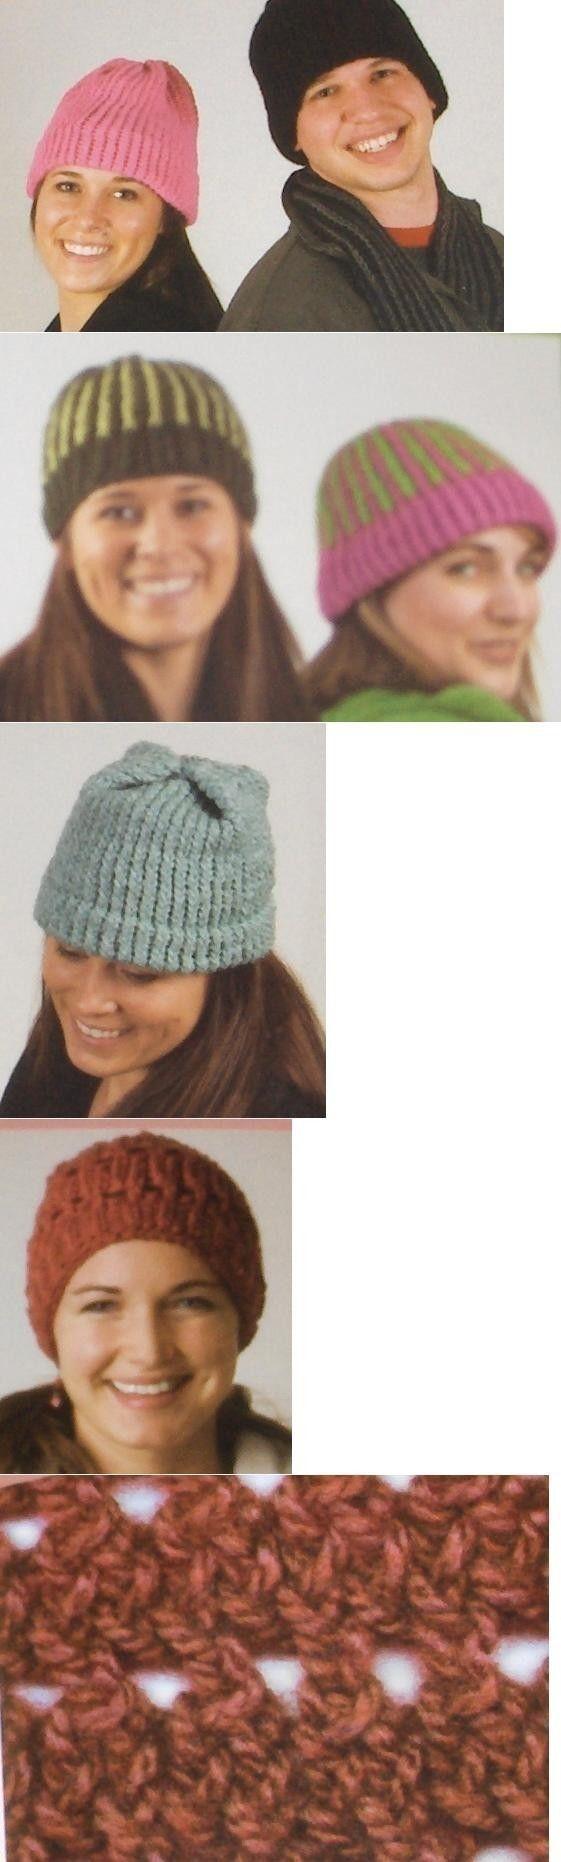 217 best Knifty-Knitter Loom - Knitting Patterns images on Pinterest ...